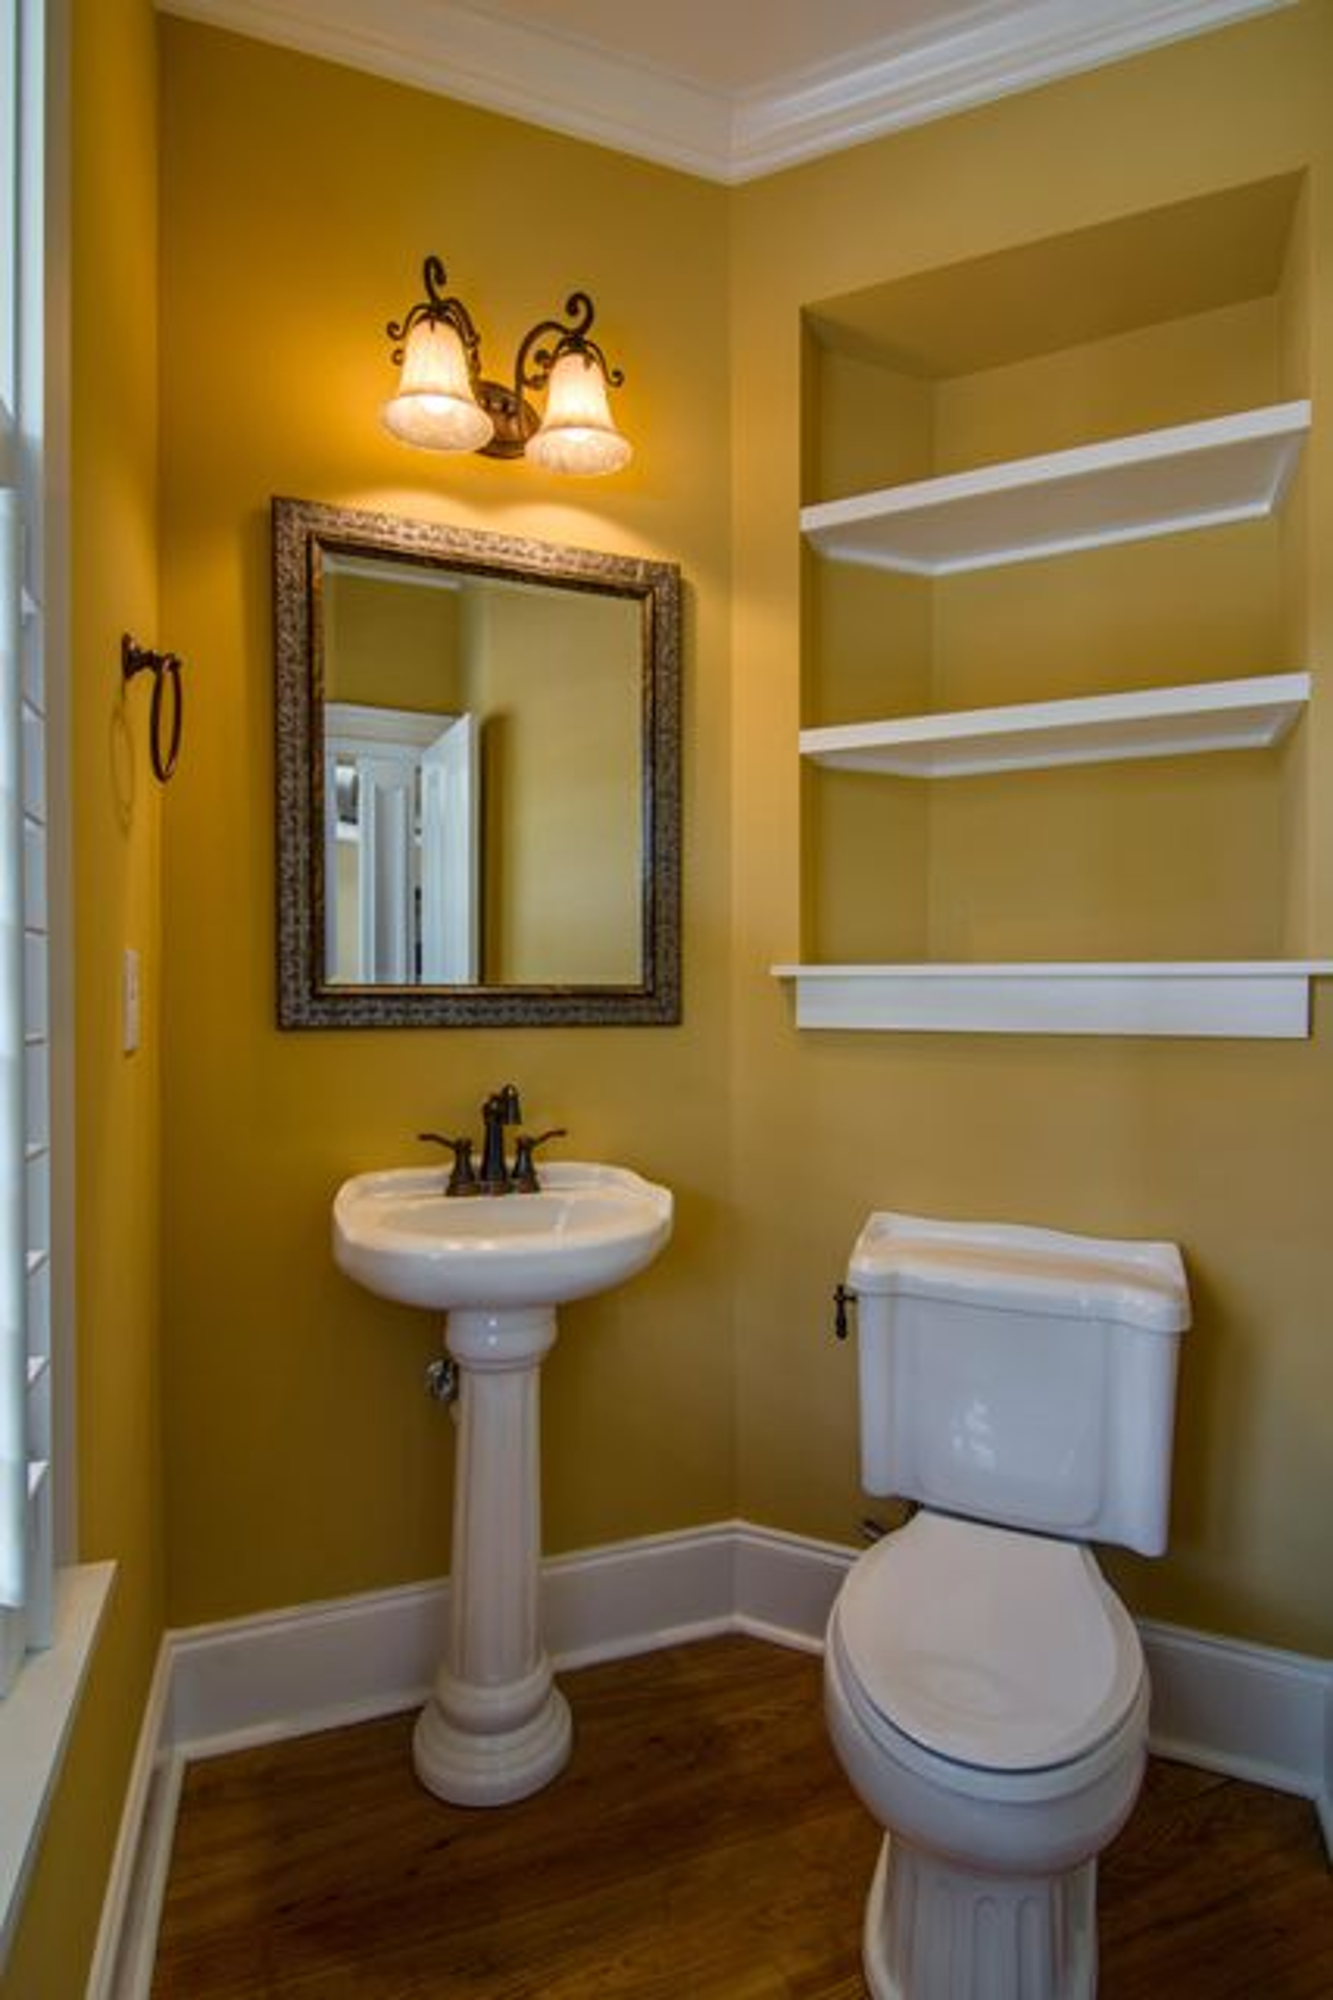 Bull Creek Peninsula Homes For Sale - 1635 Bull Creek, Charleston, SC - 23